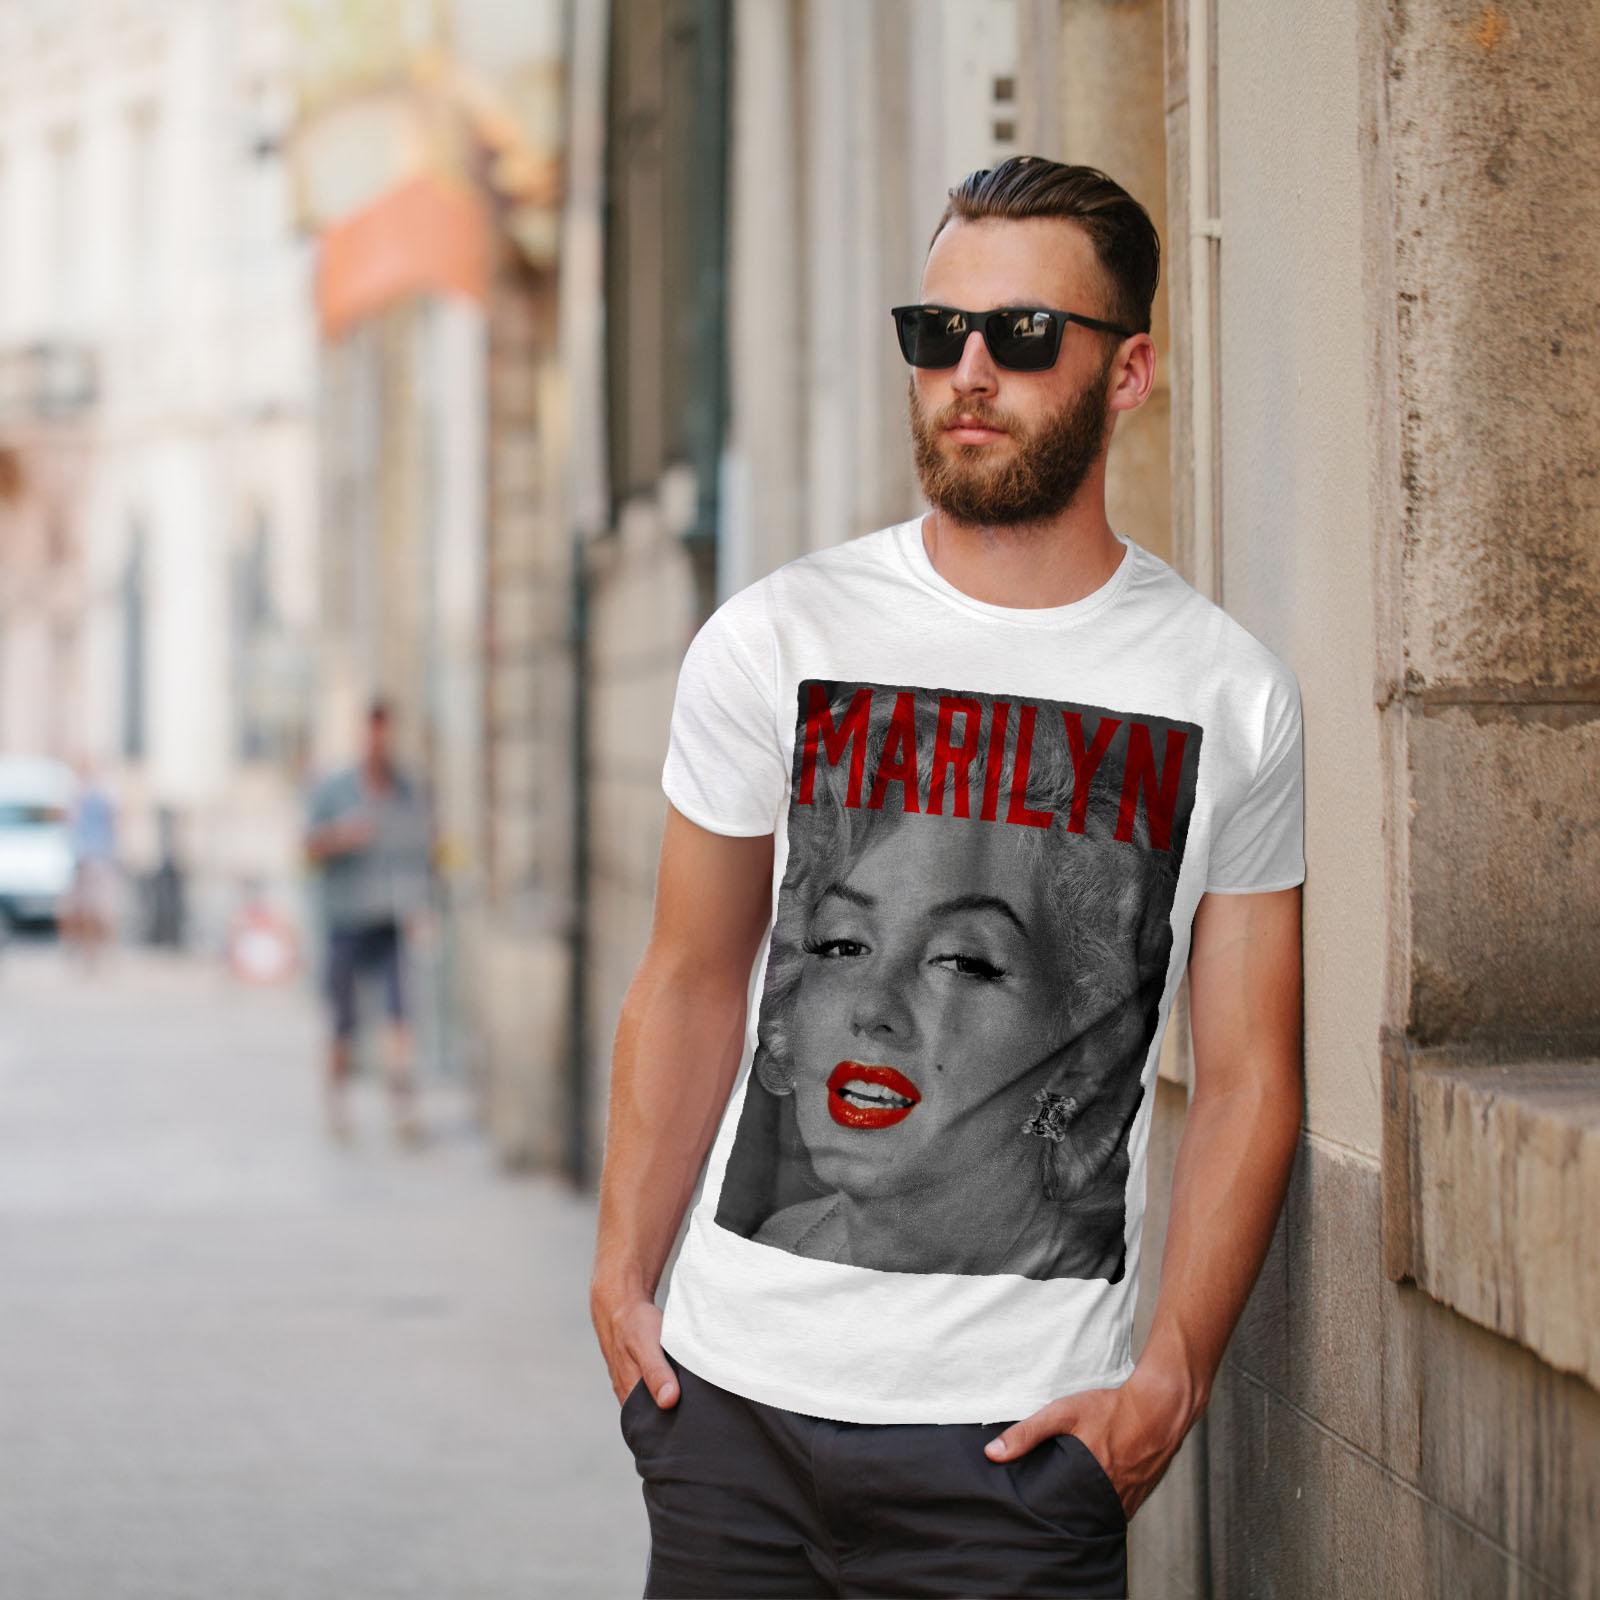 Wellcoda-Marilyn-Retro-Photo-Mens-T-shirt-Urban-Graphic-Design-Printed-Tee thumbnail 11